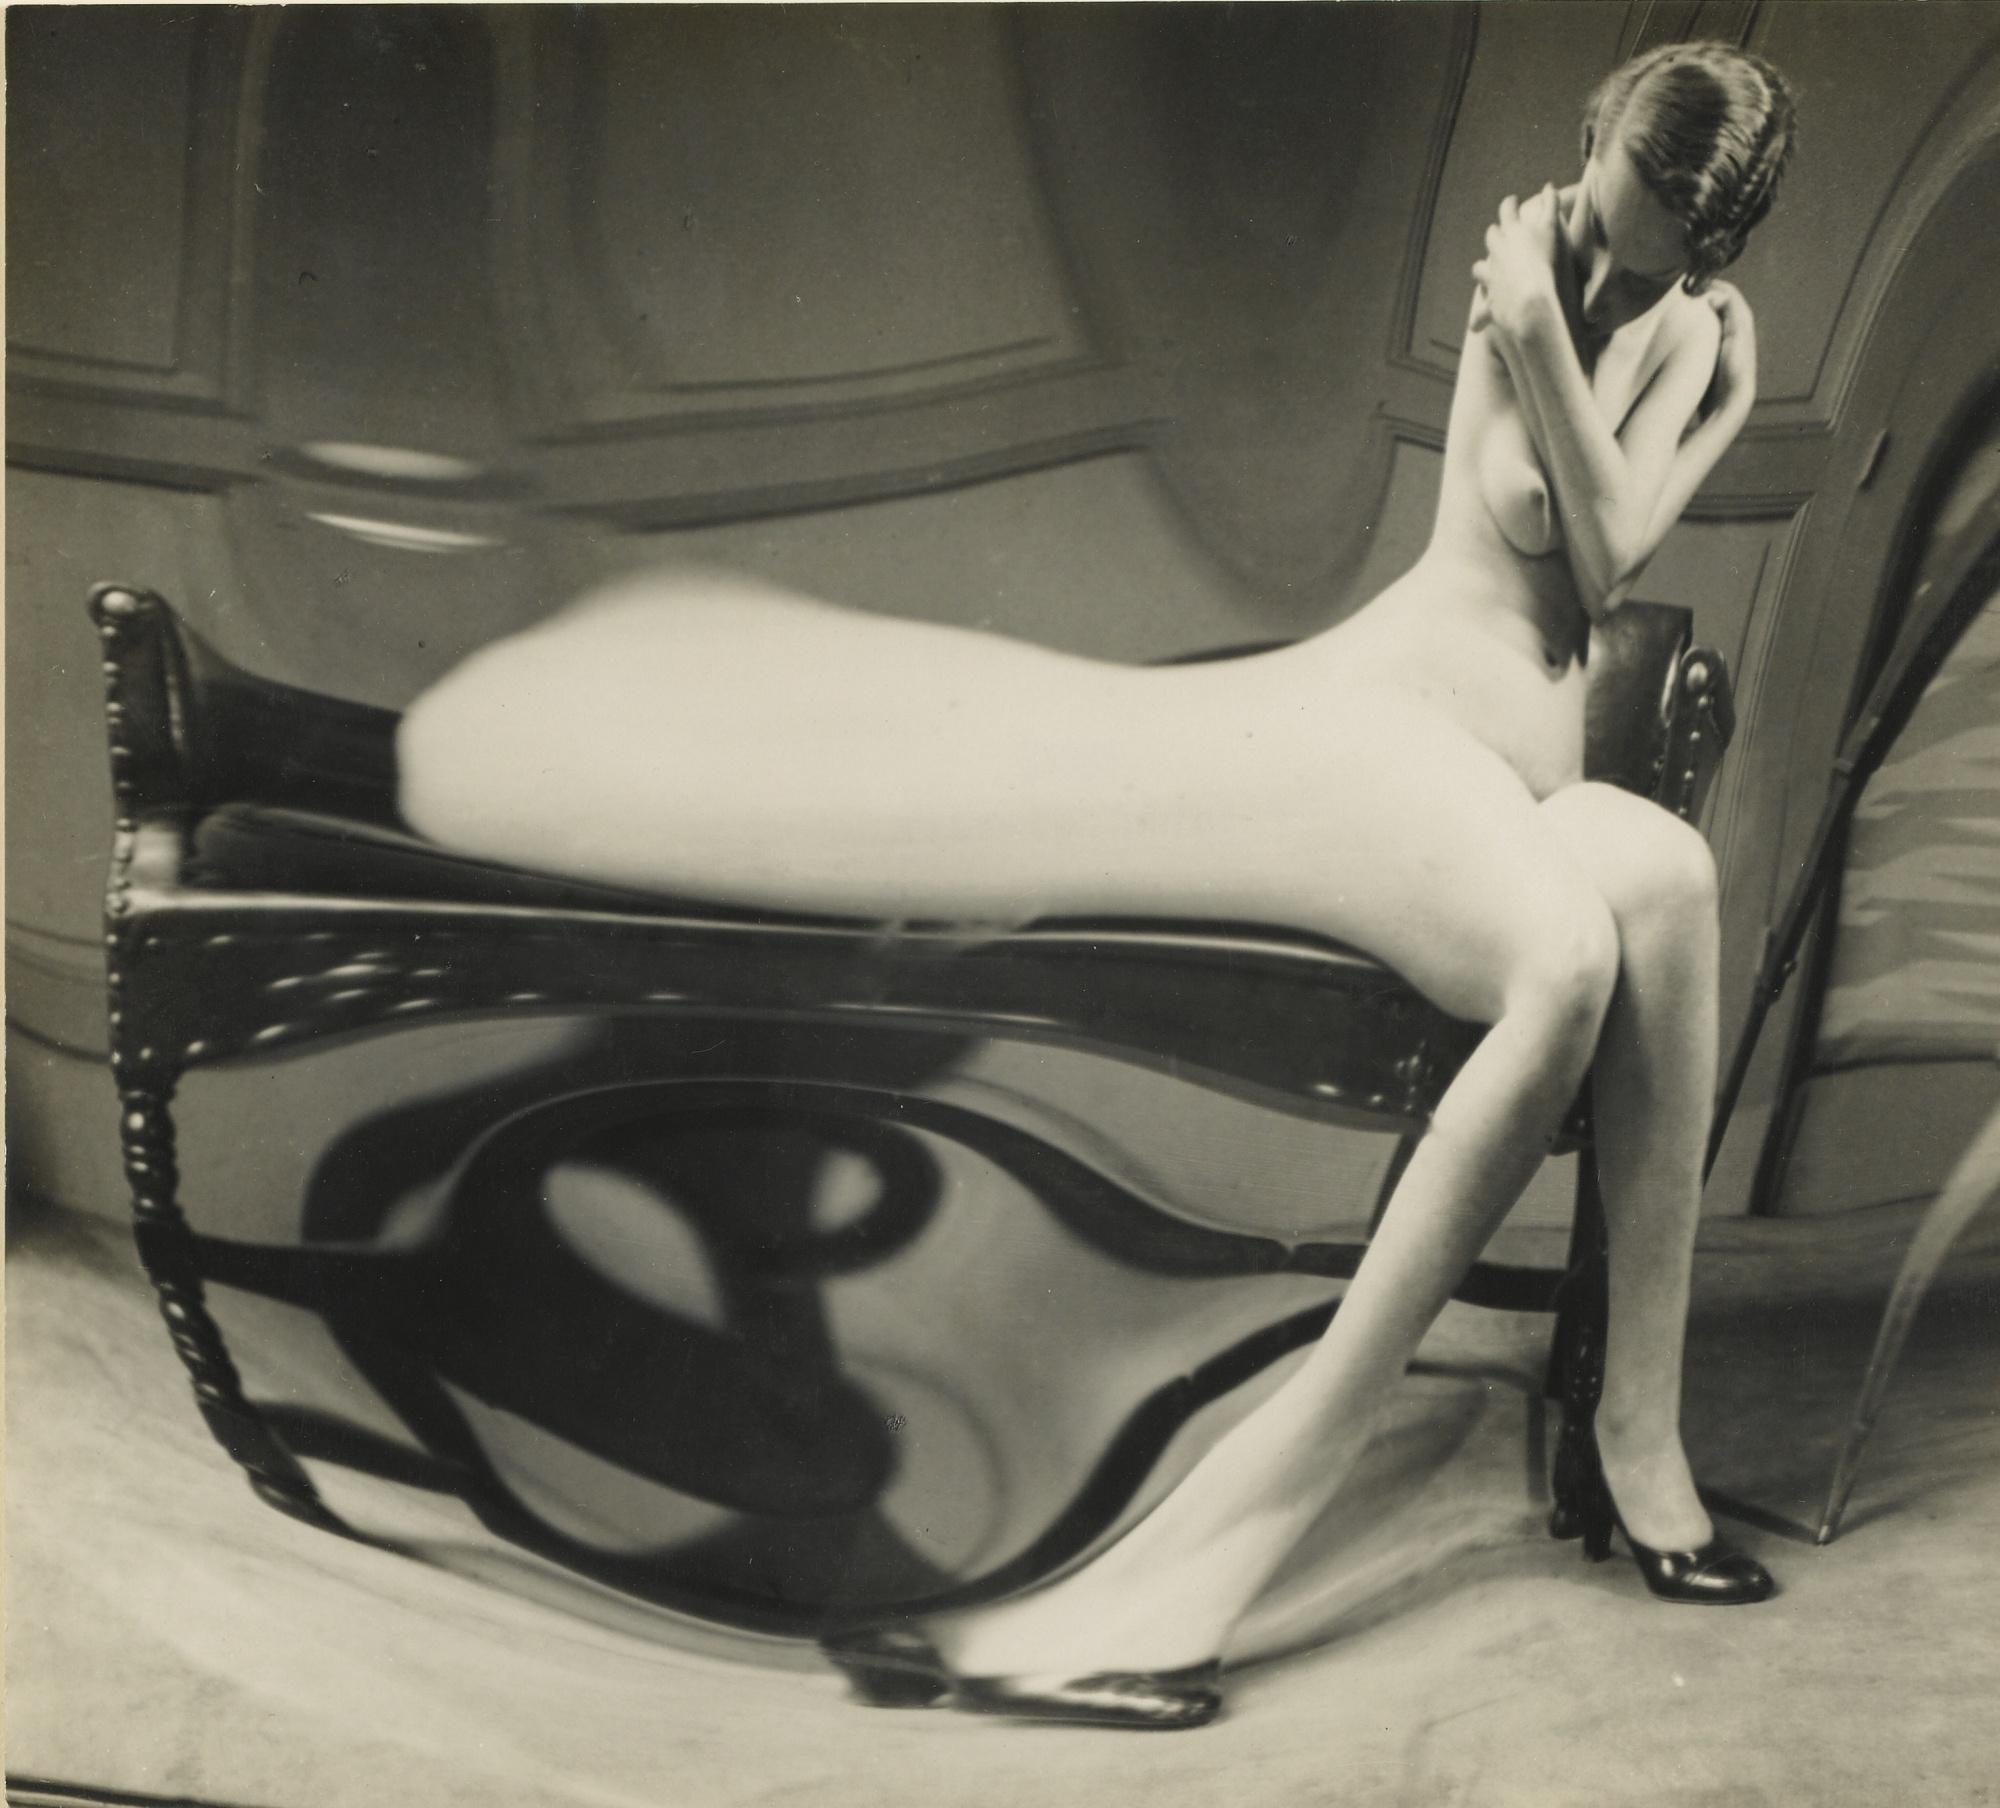 Andre Kertesz-Distortion #78-1933